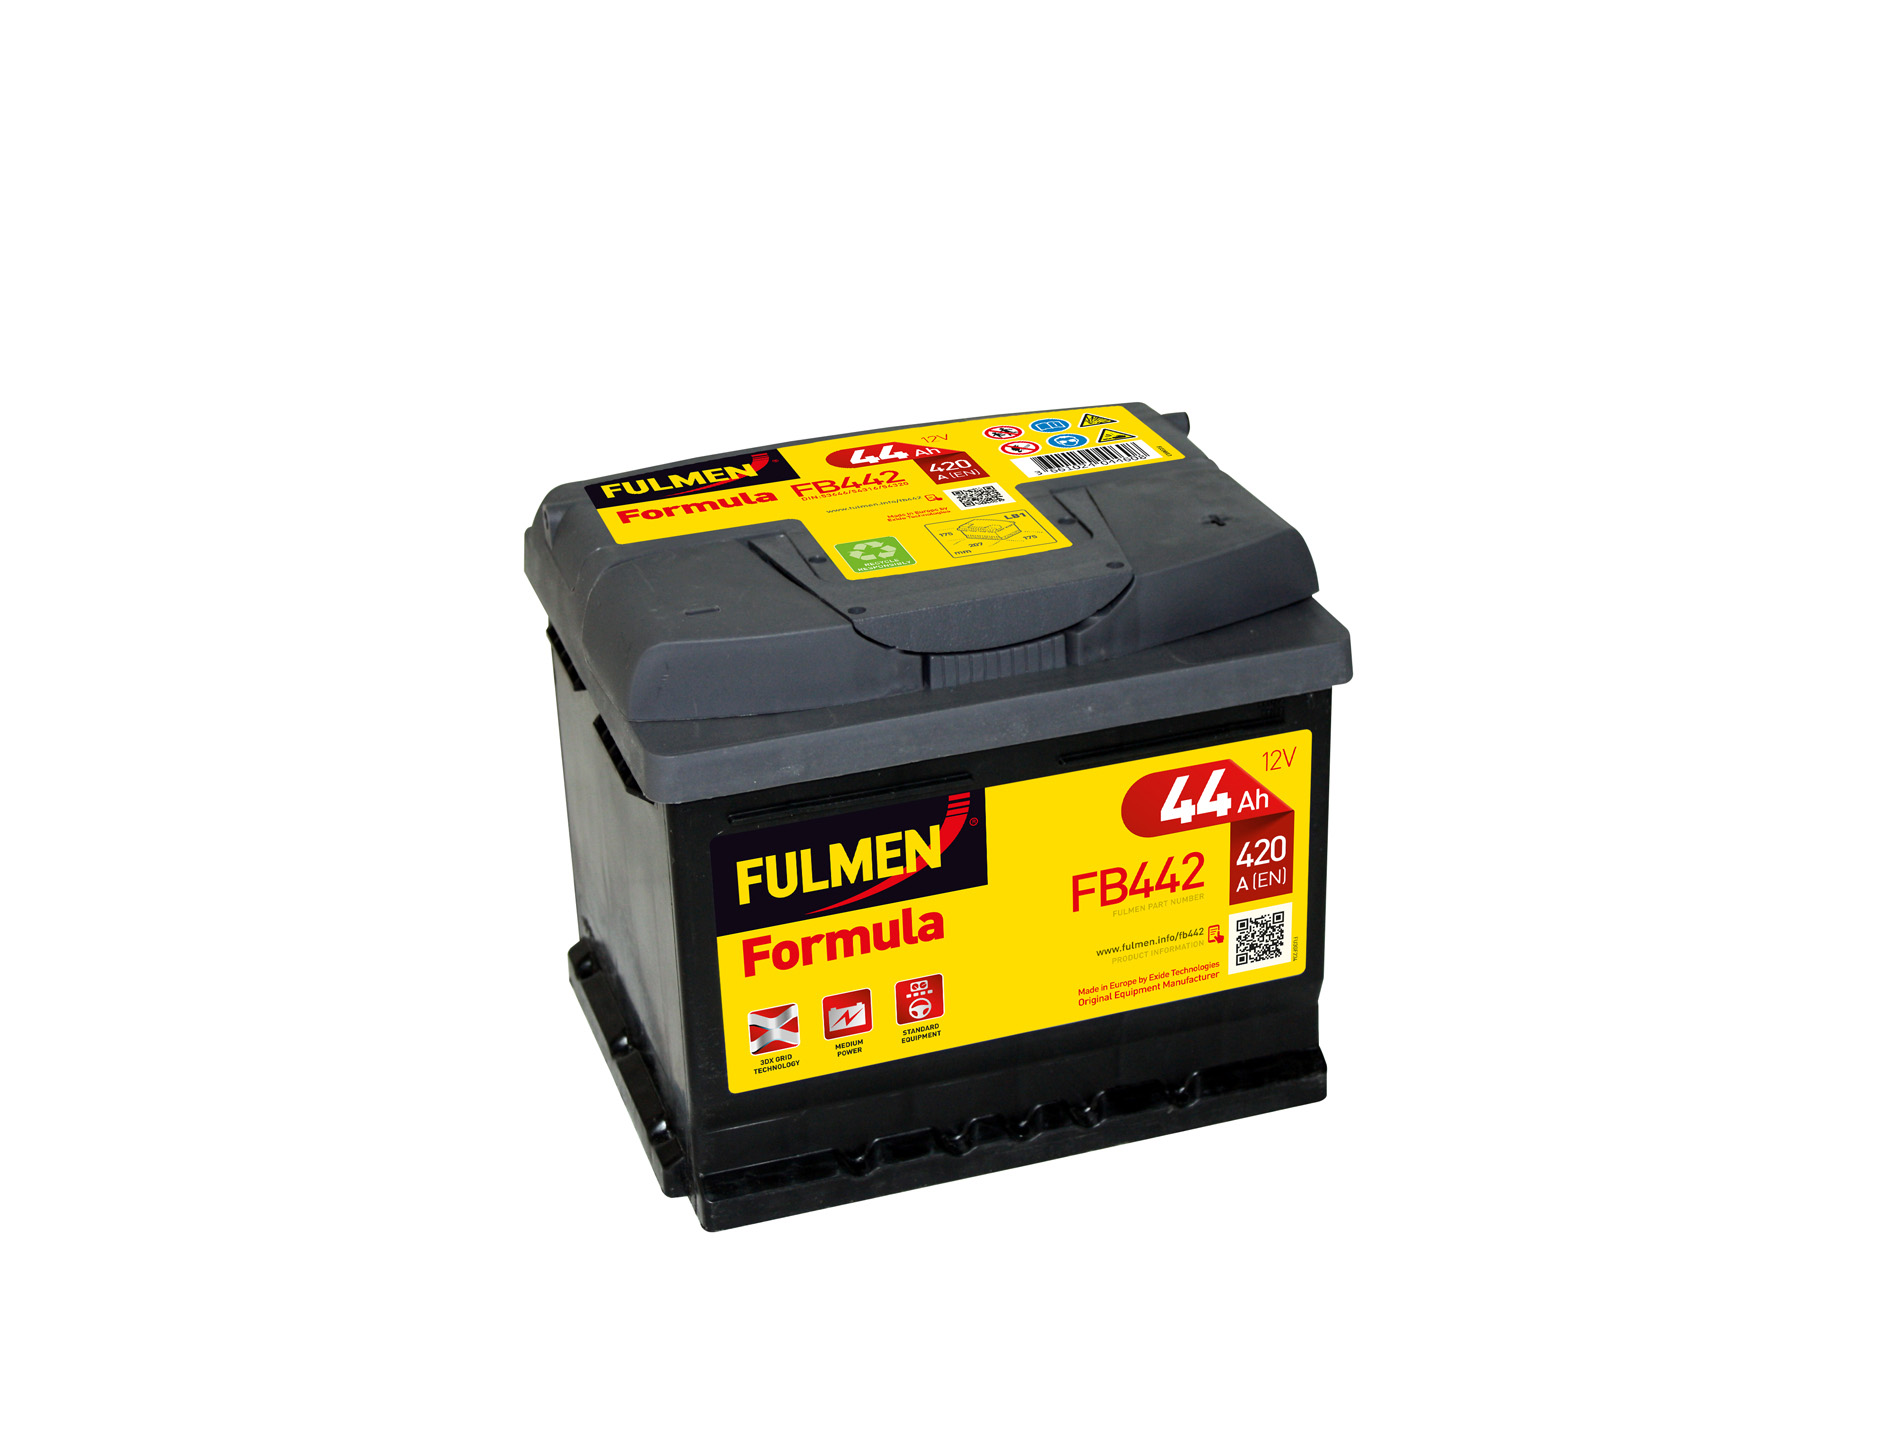 batterie fulmen formula fb442 12v 44ah 420a d batterie auto remorques entretien auto. Black Bedroom Furniture Sets. Home Design Ideas